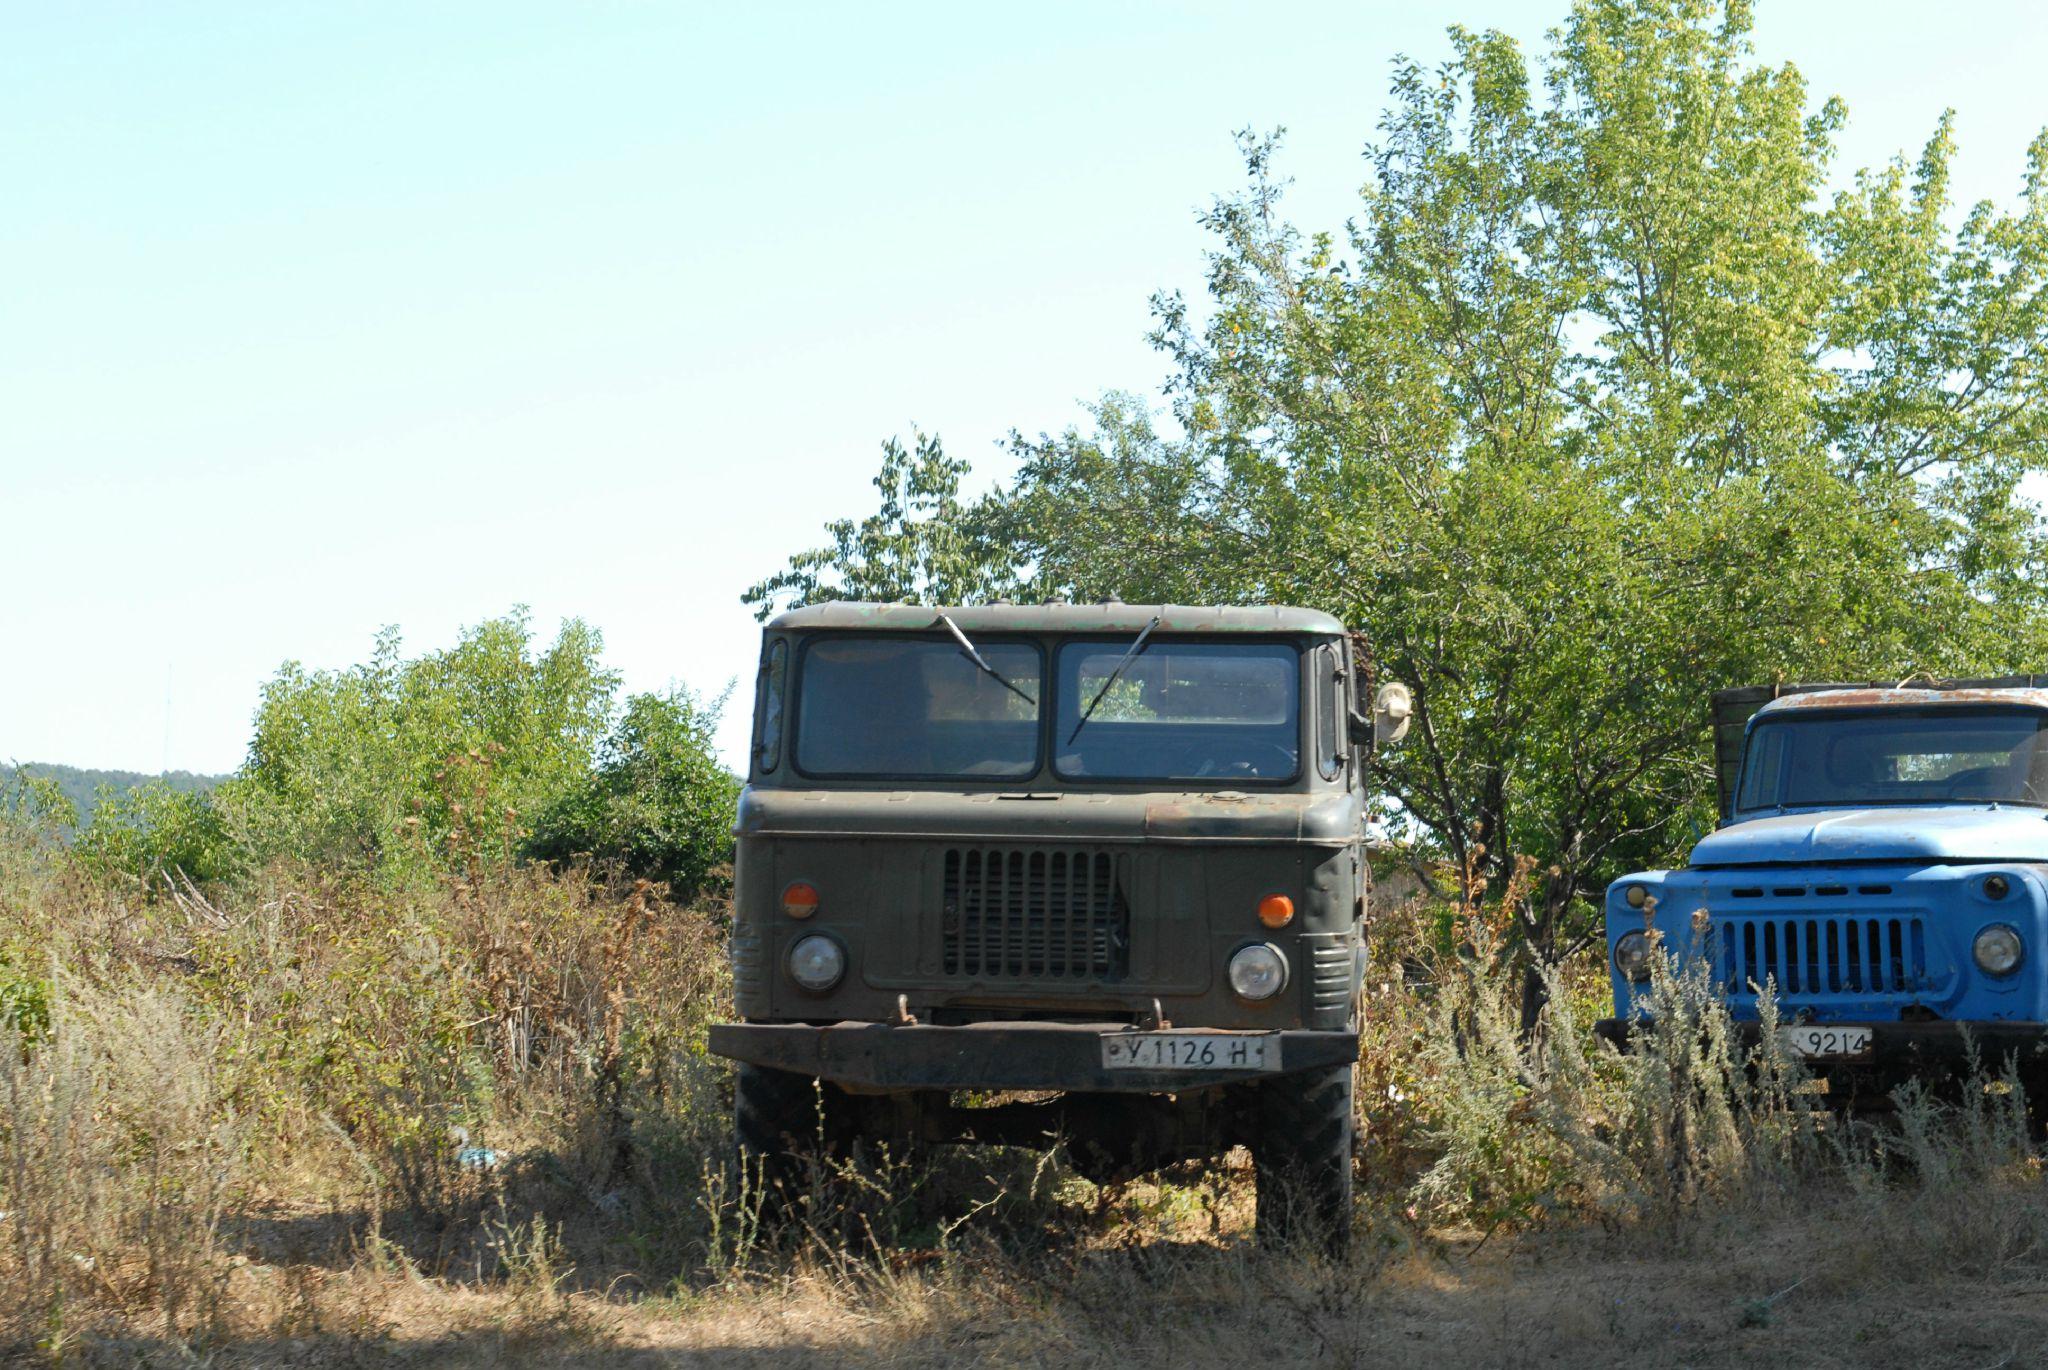 Camion russe en bulgarie